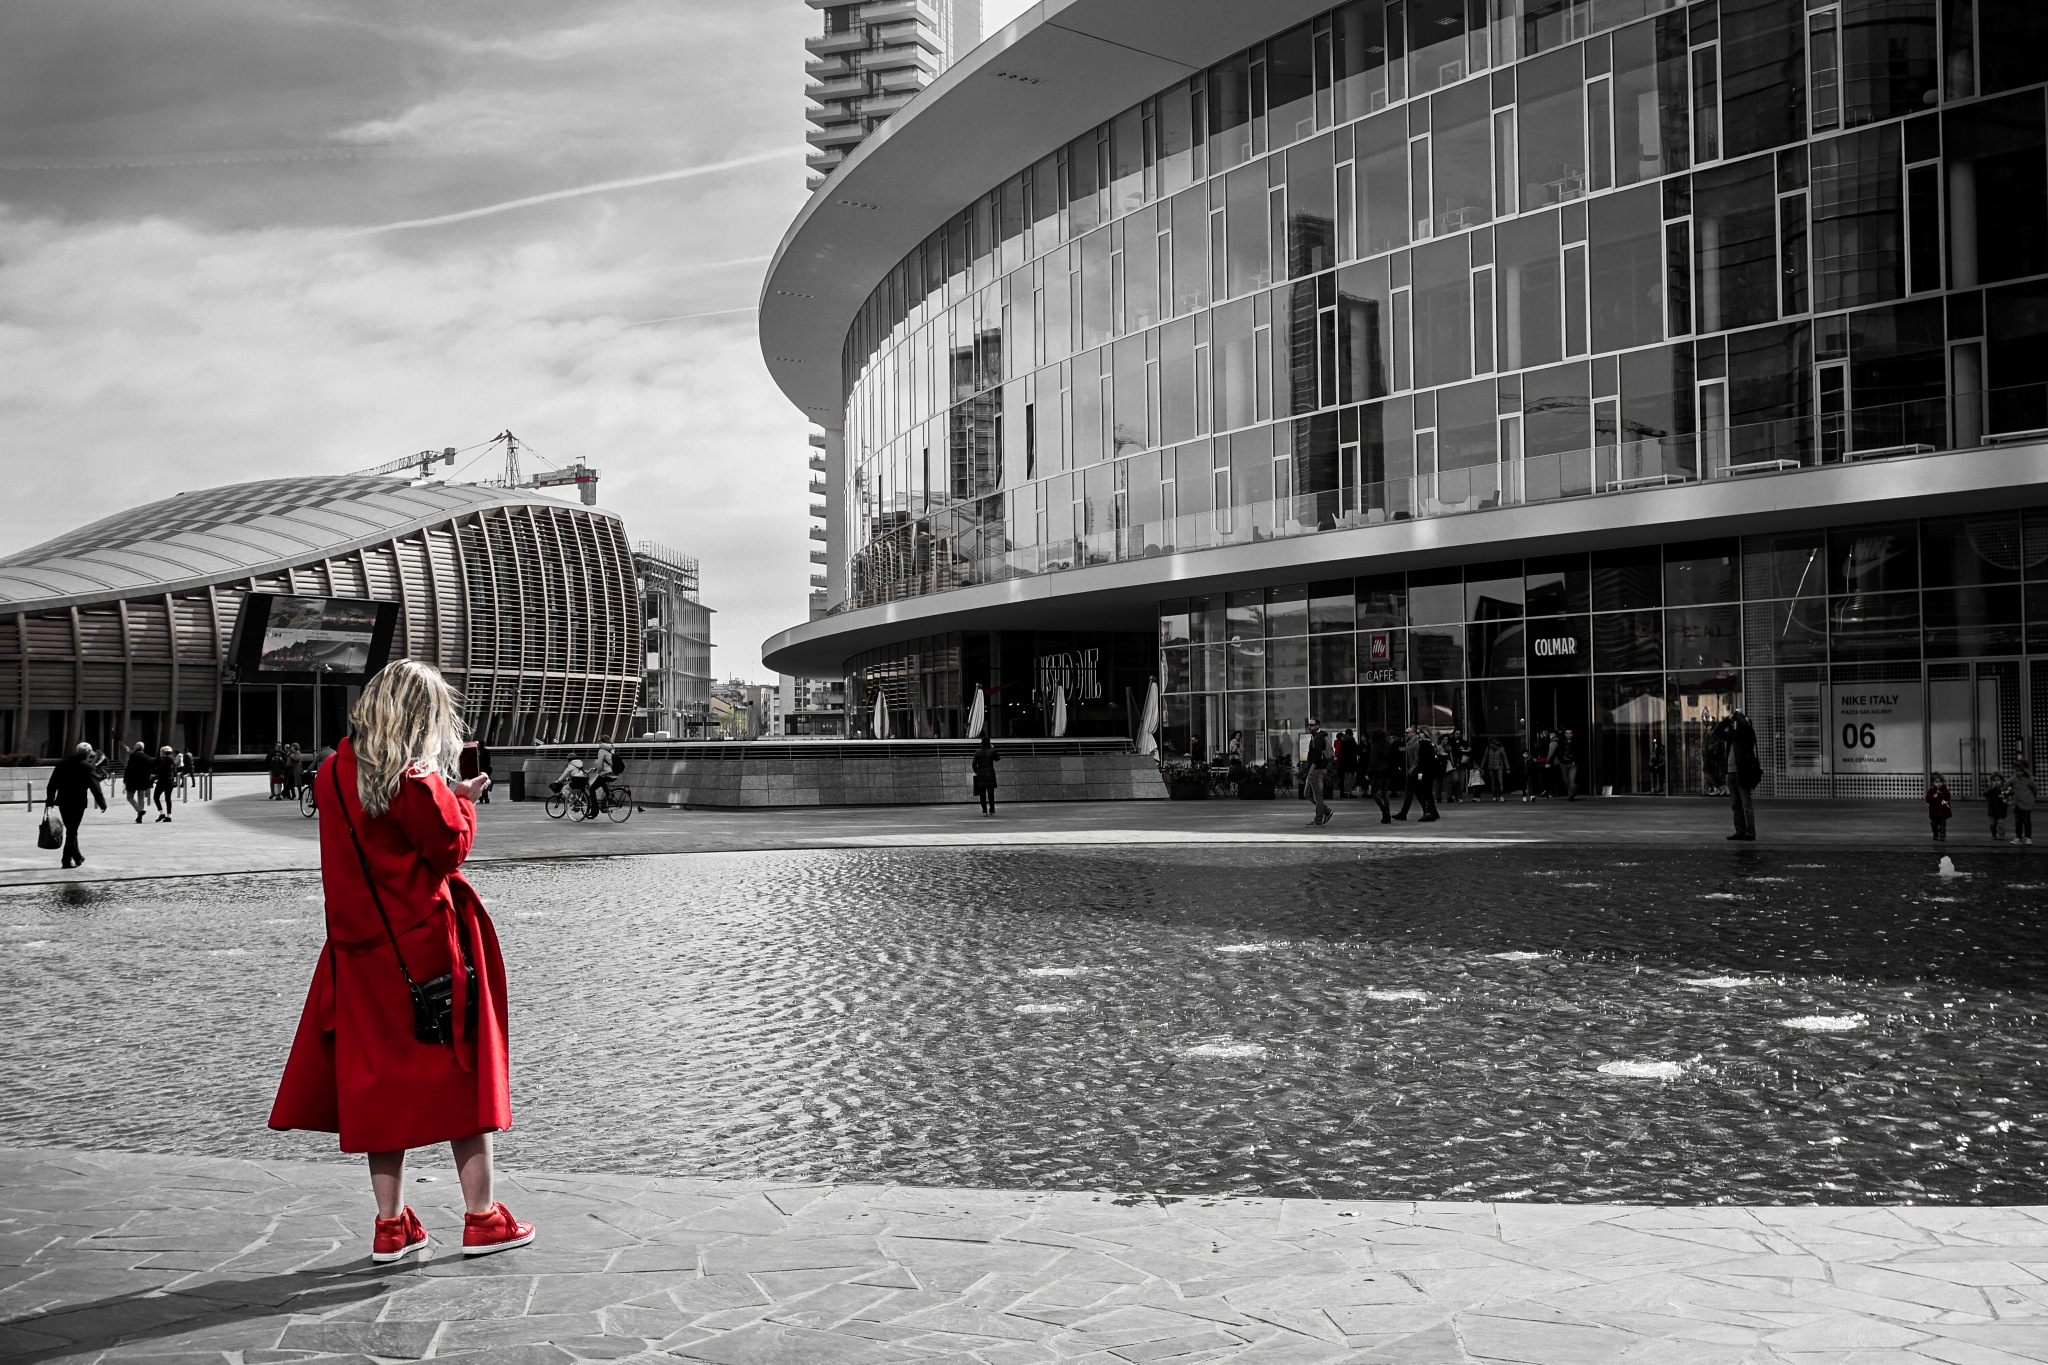 city in red by francescogelati